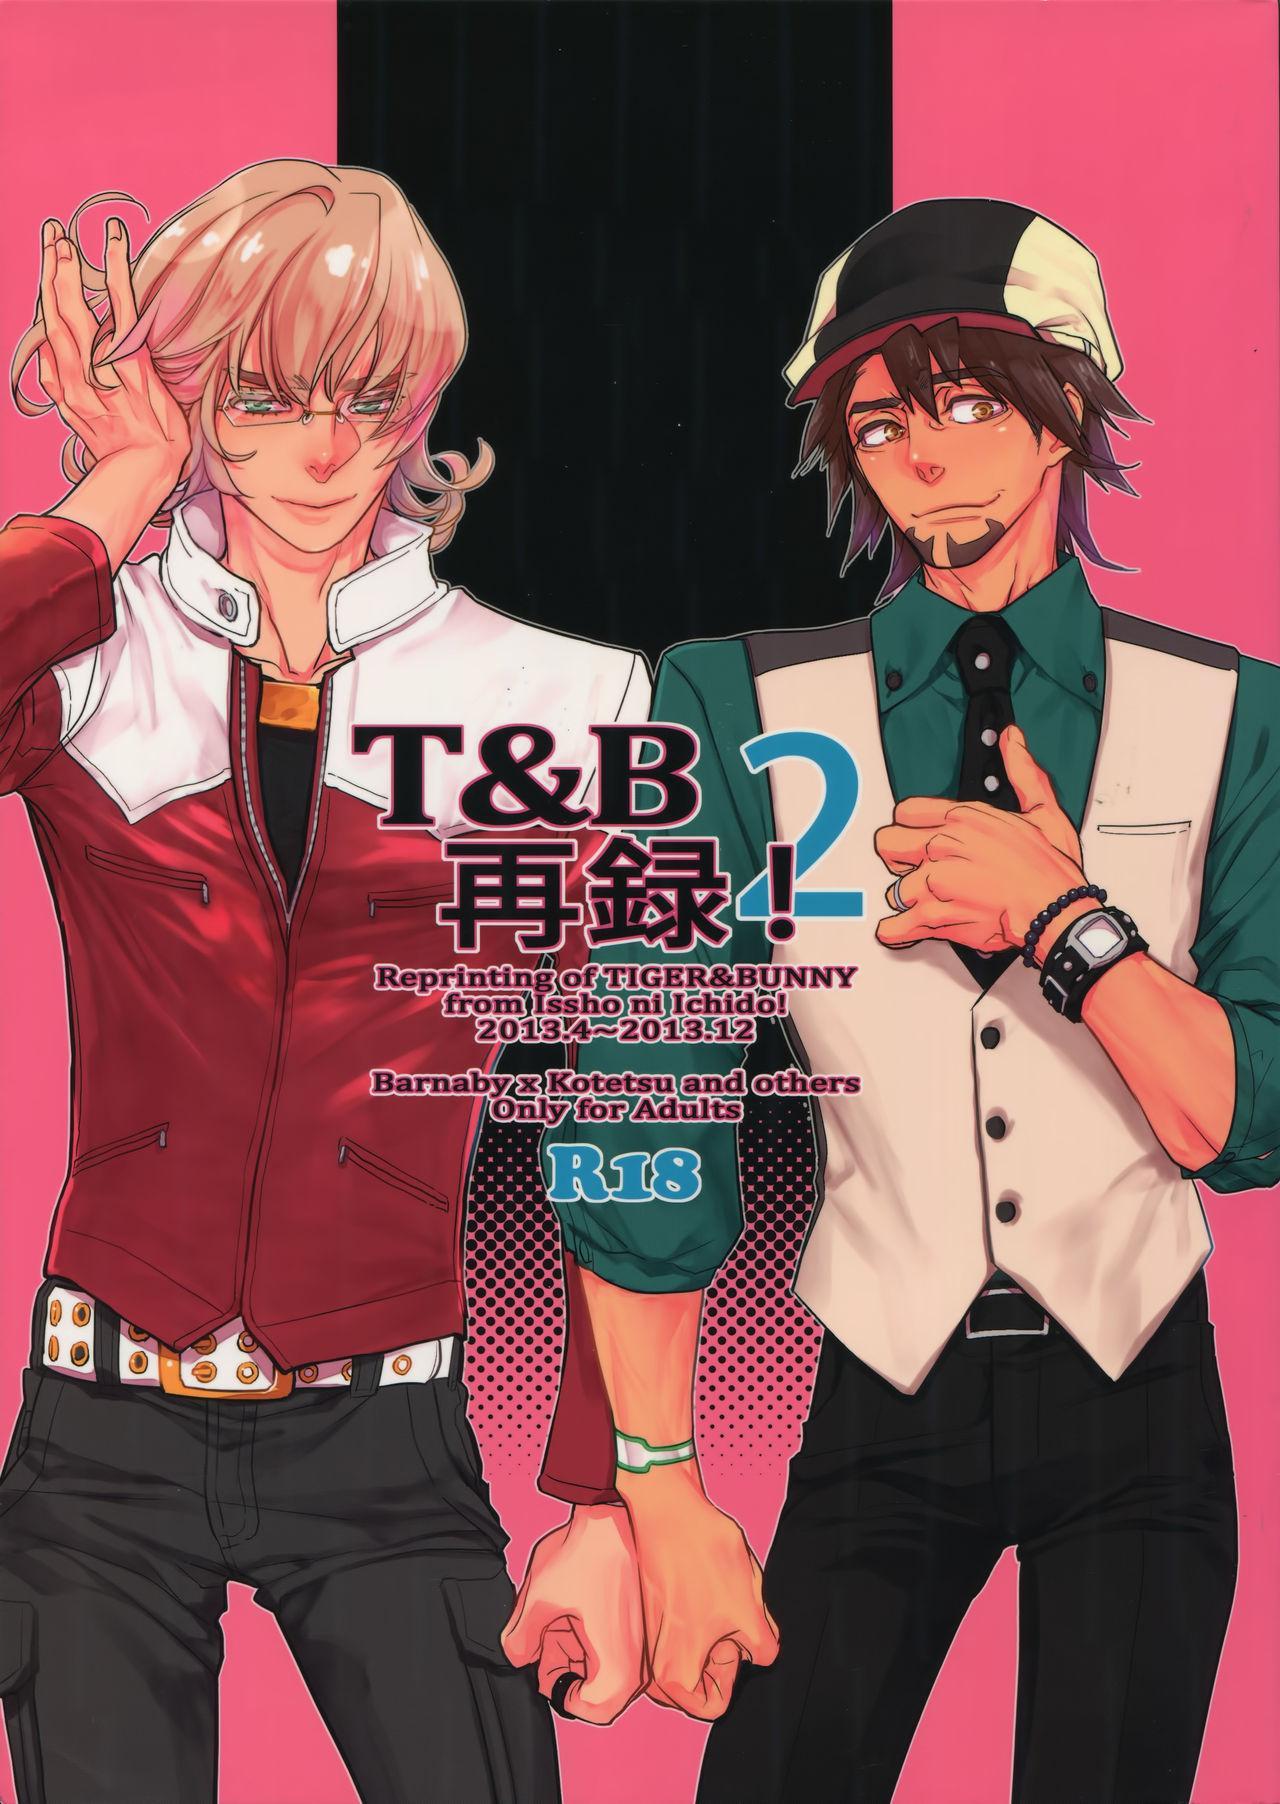 T&B Sairoku! 2 0